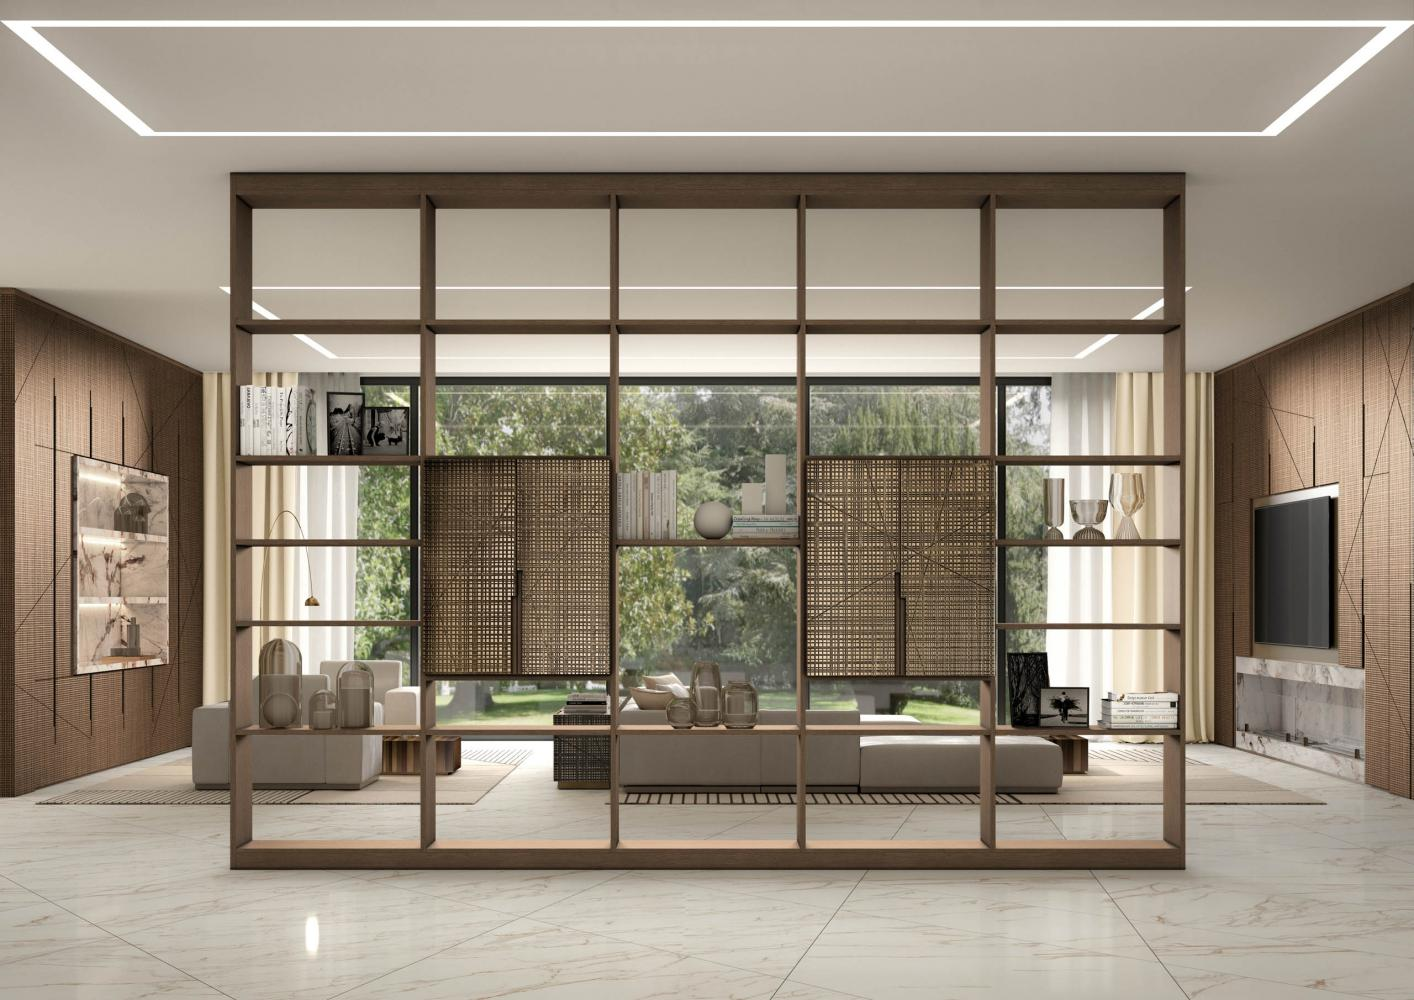 laurameroni maxima day system in wood for luxury livingroom interior design